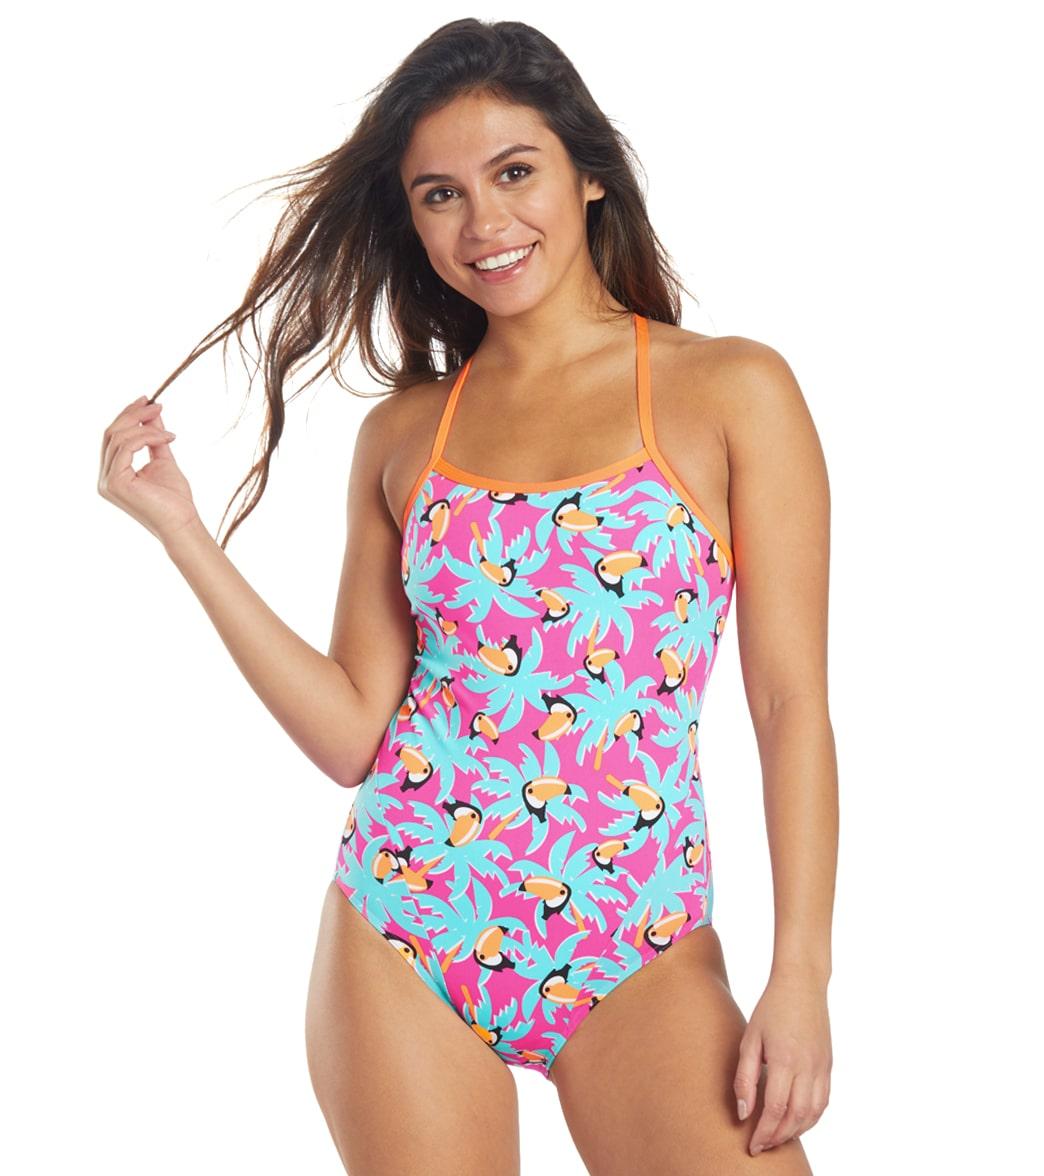 Funkita Women's Toucan Tango Eco Single Strap One Piece Swimsuit